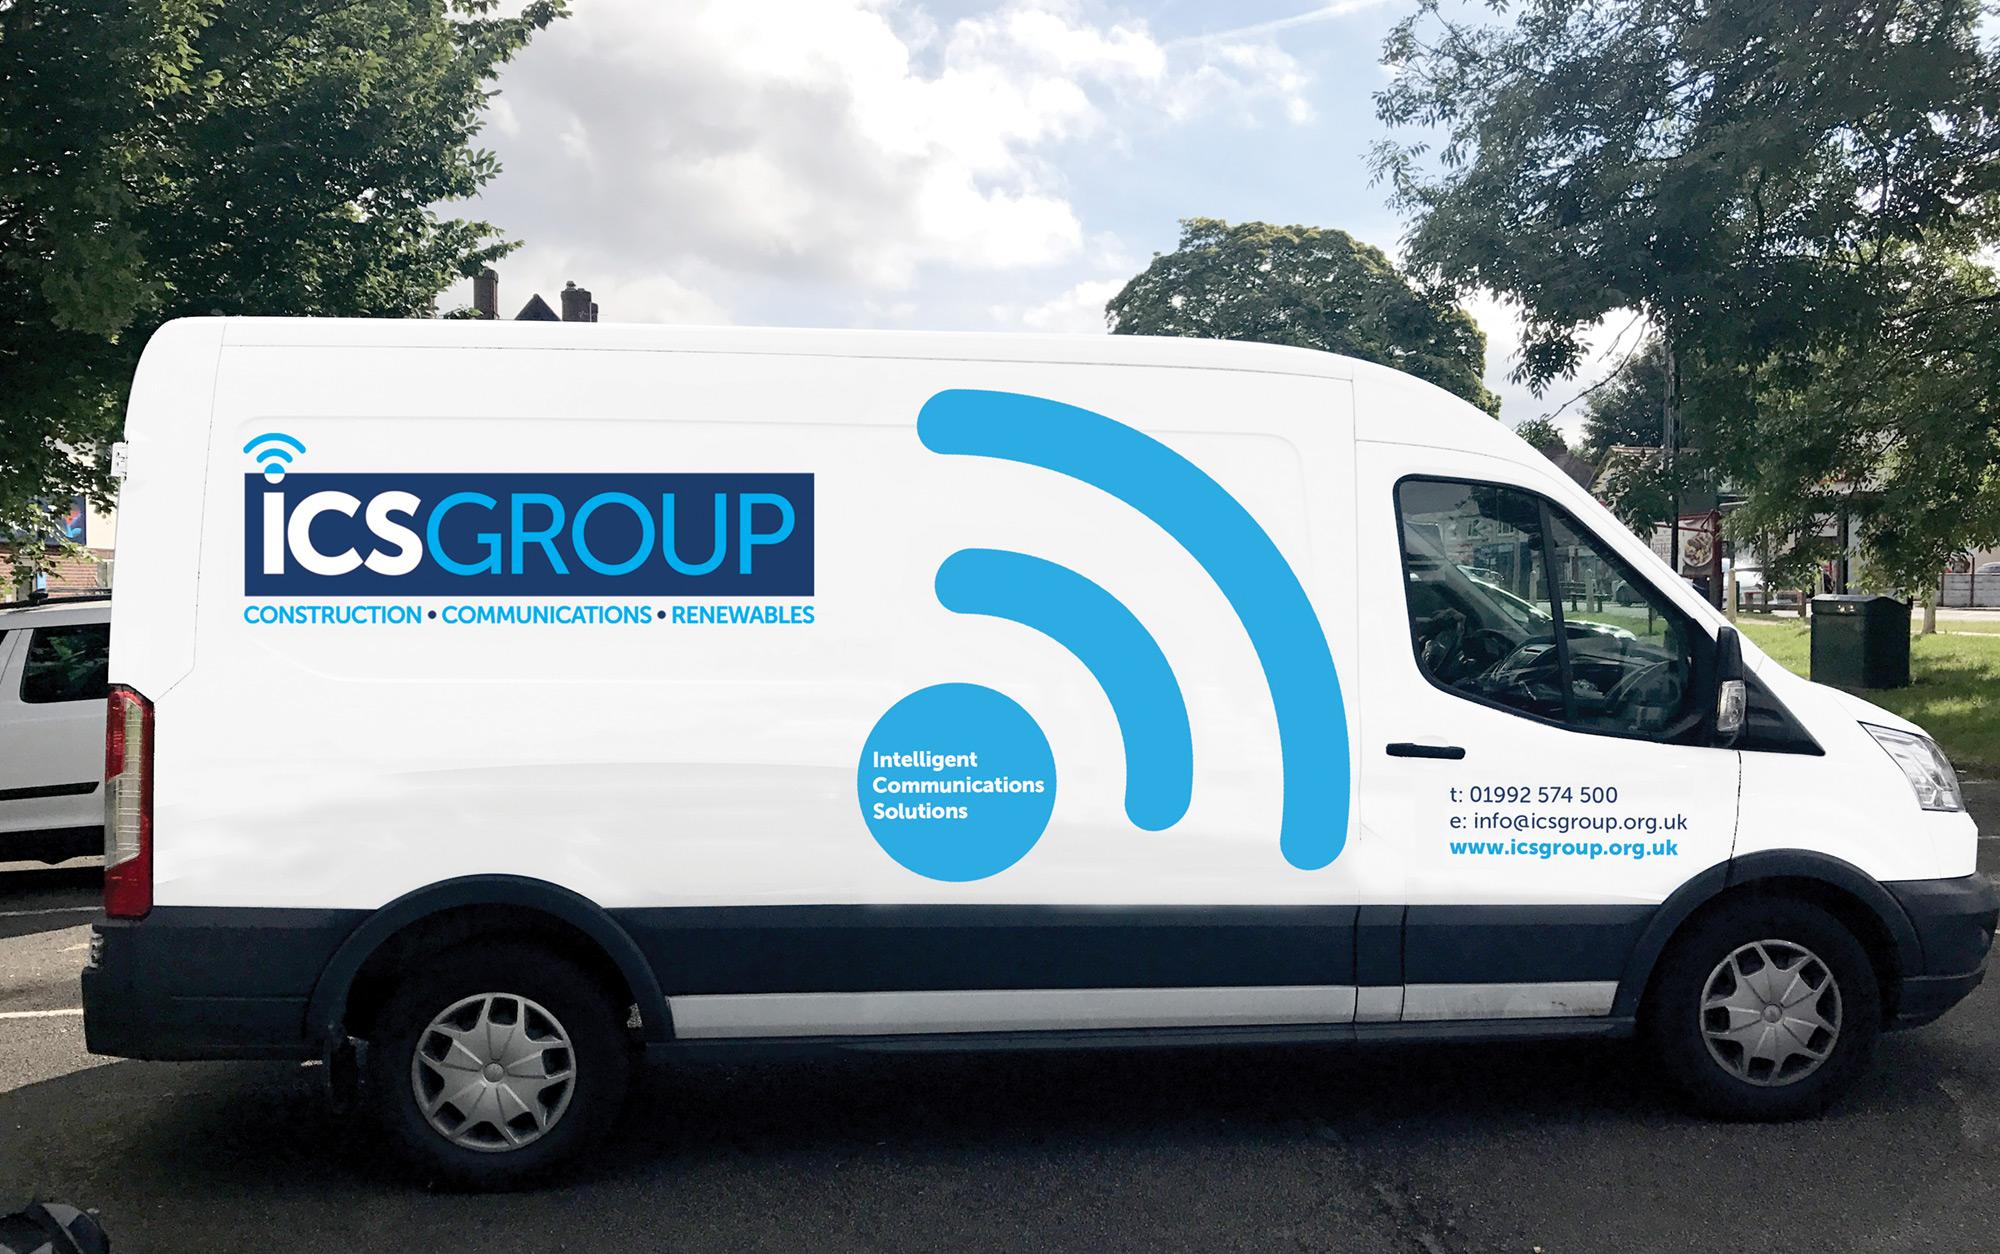 ICS Group vehicle livery